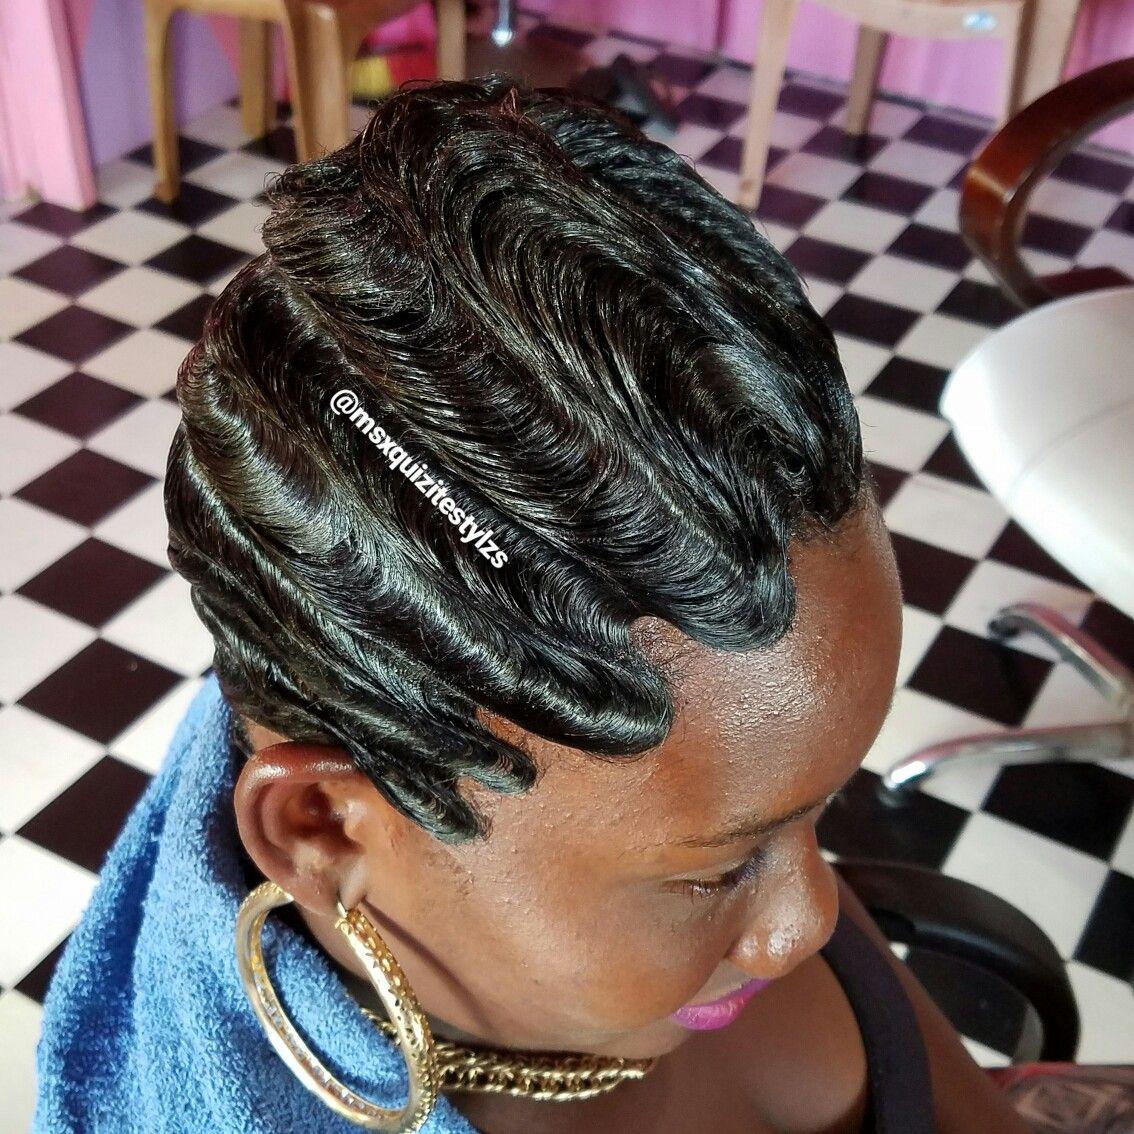 Pin by Merle Spain on HAIR u BEAUTY TIPS  Pinterest